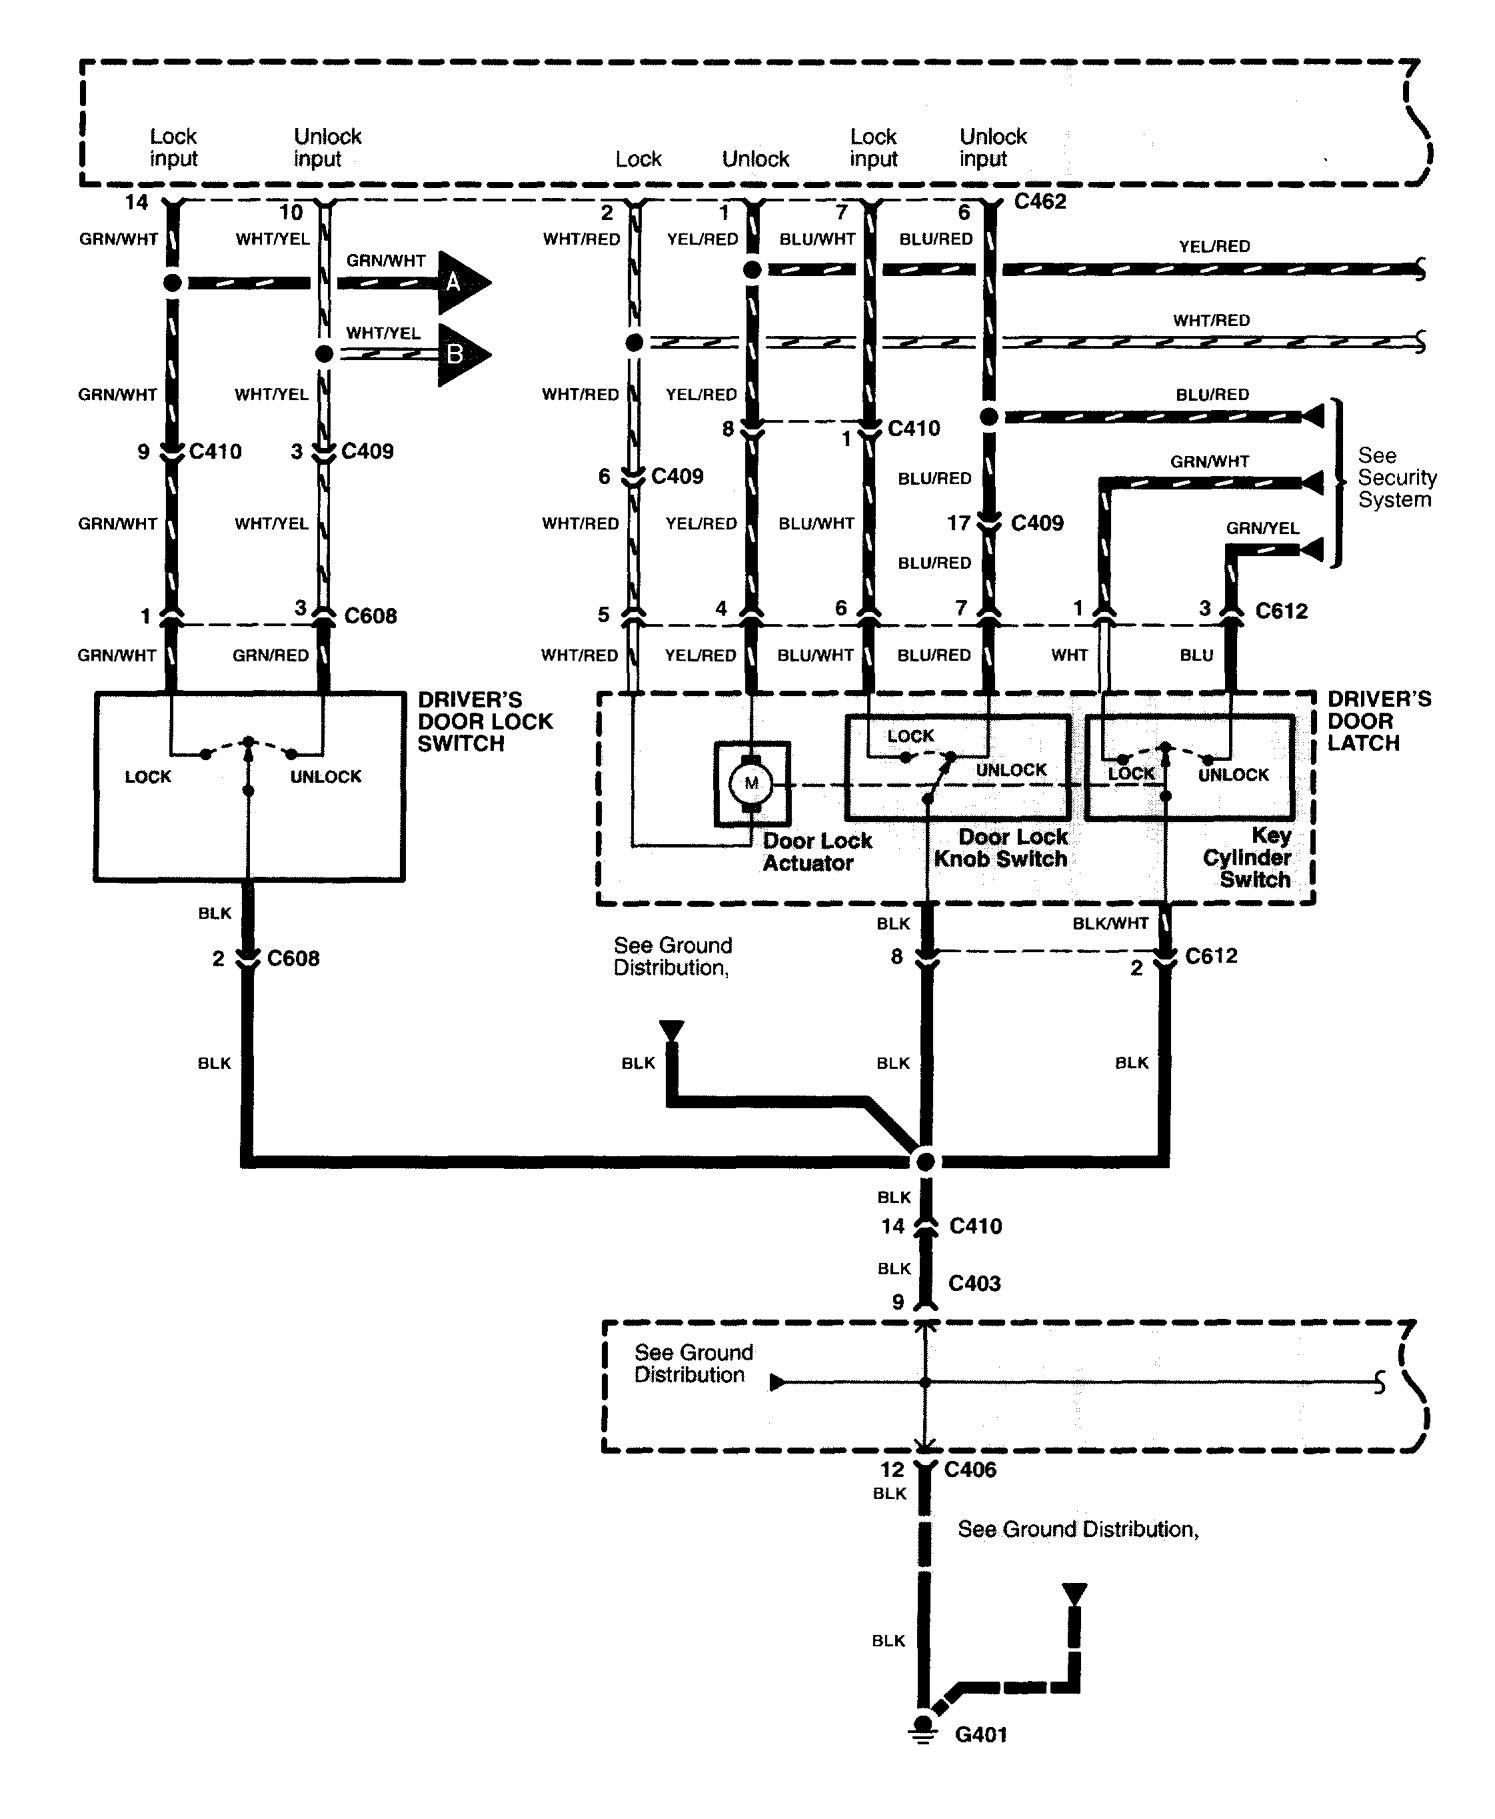 Acura Tsx Radio Wiring Diagram | Wiring Diagram on